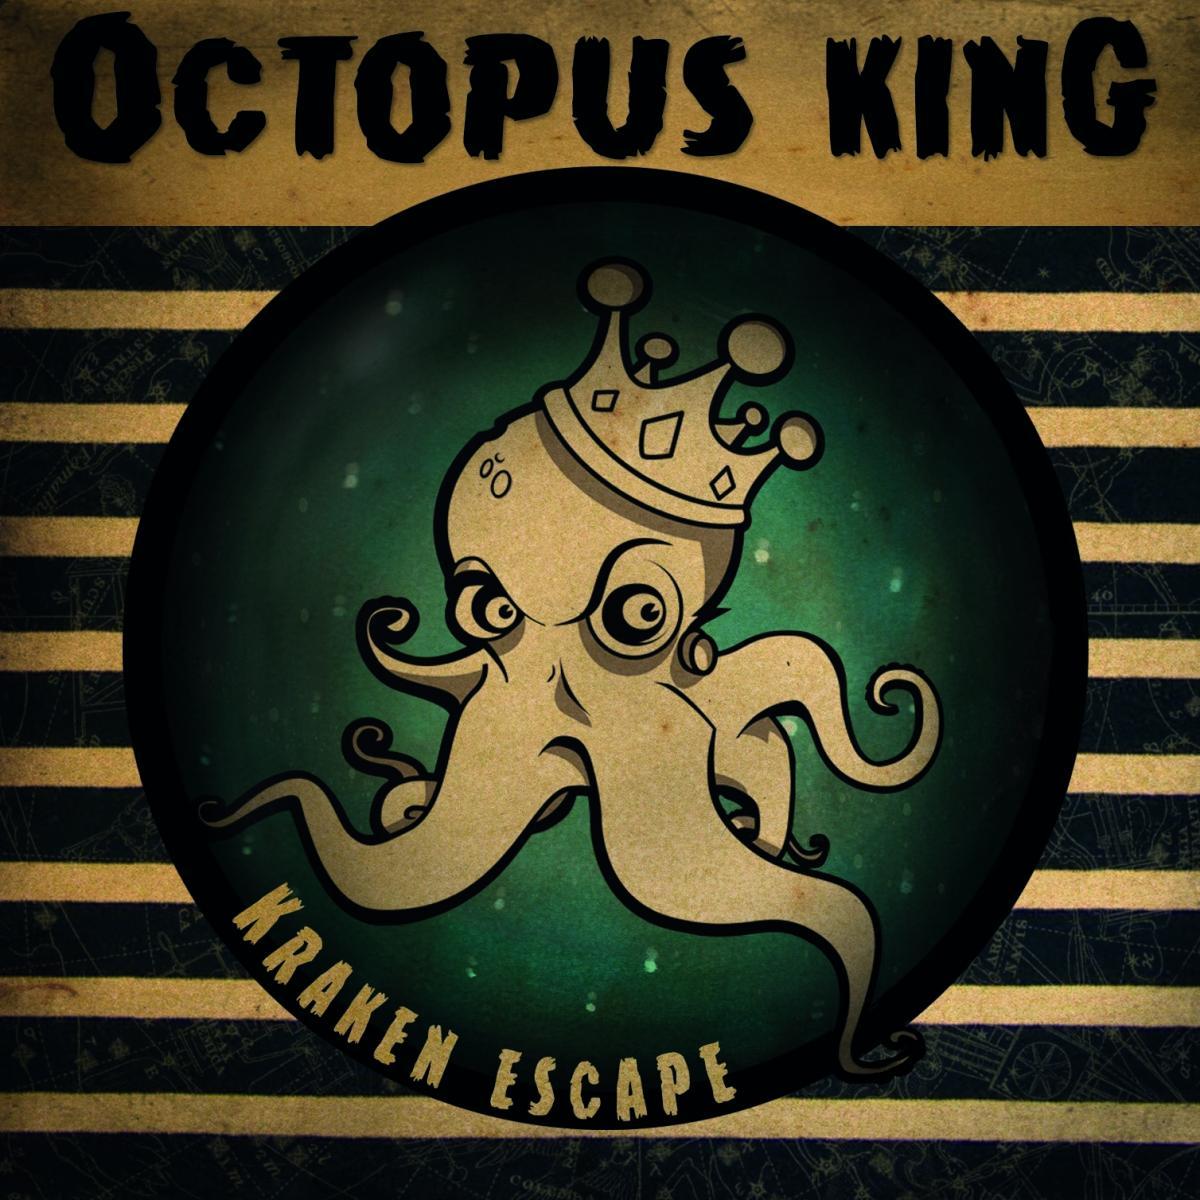 Octopus King Kraken Escape